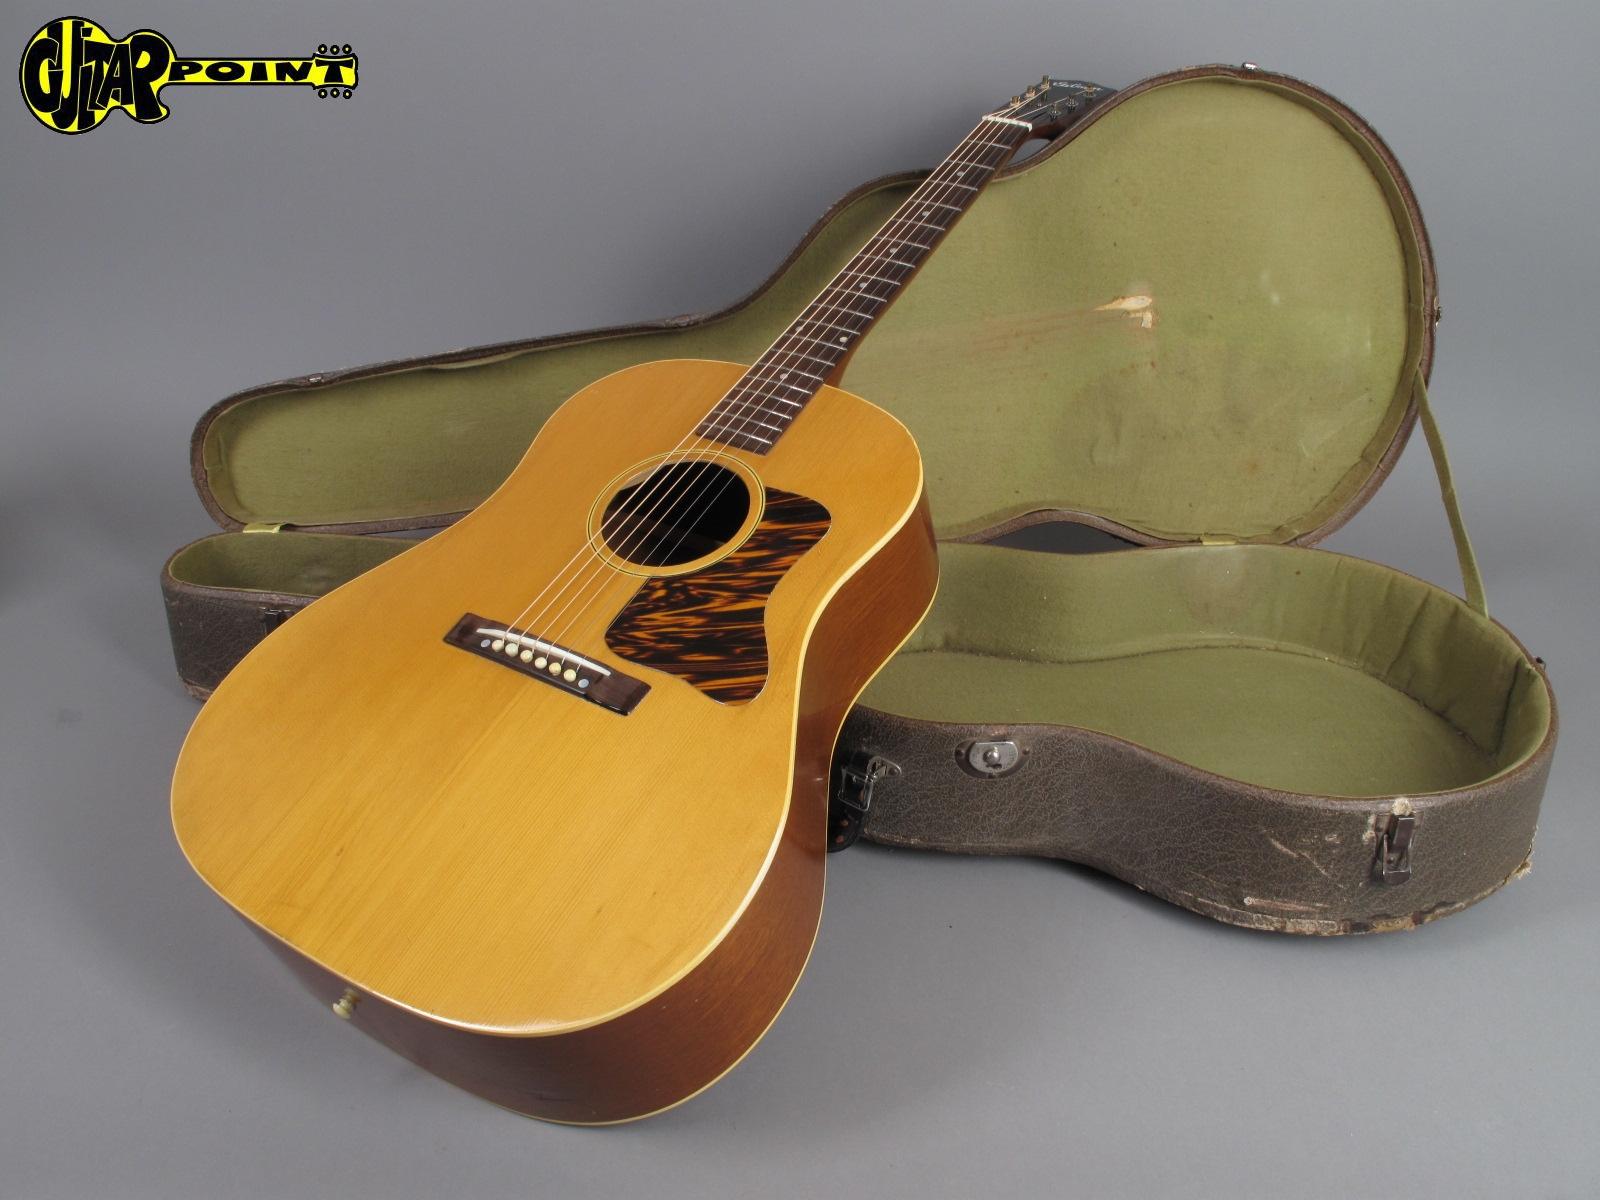 https://guitarpoint.de/app/uploads/products/1940-gibson-j-35-natural/Gibson40J35NT1994F_10.jpg